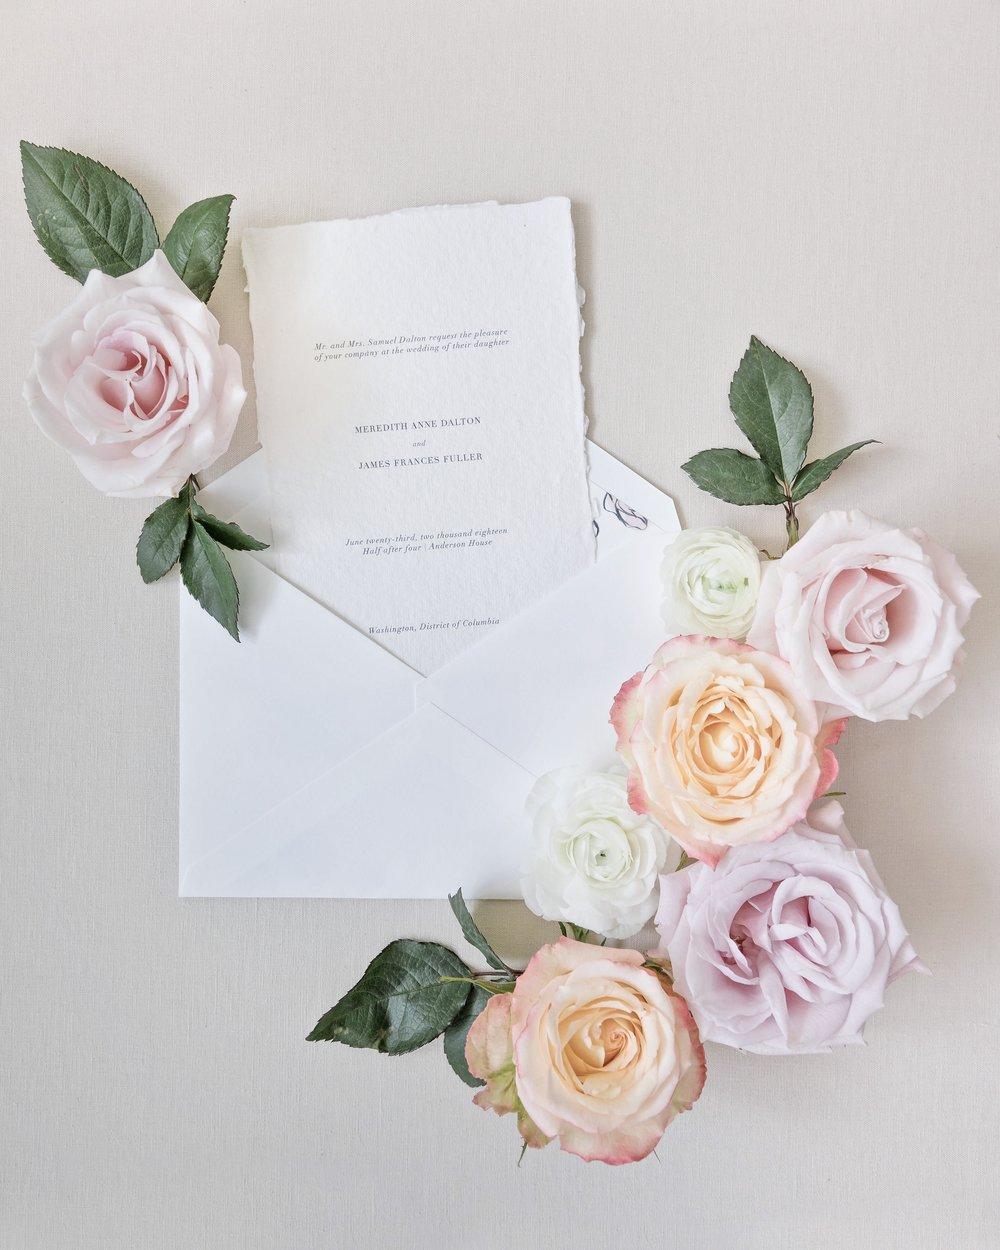 Romantic Wedding Invitation on Handmade Paper by Locust House Fine Stationery